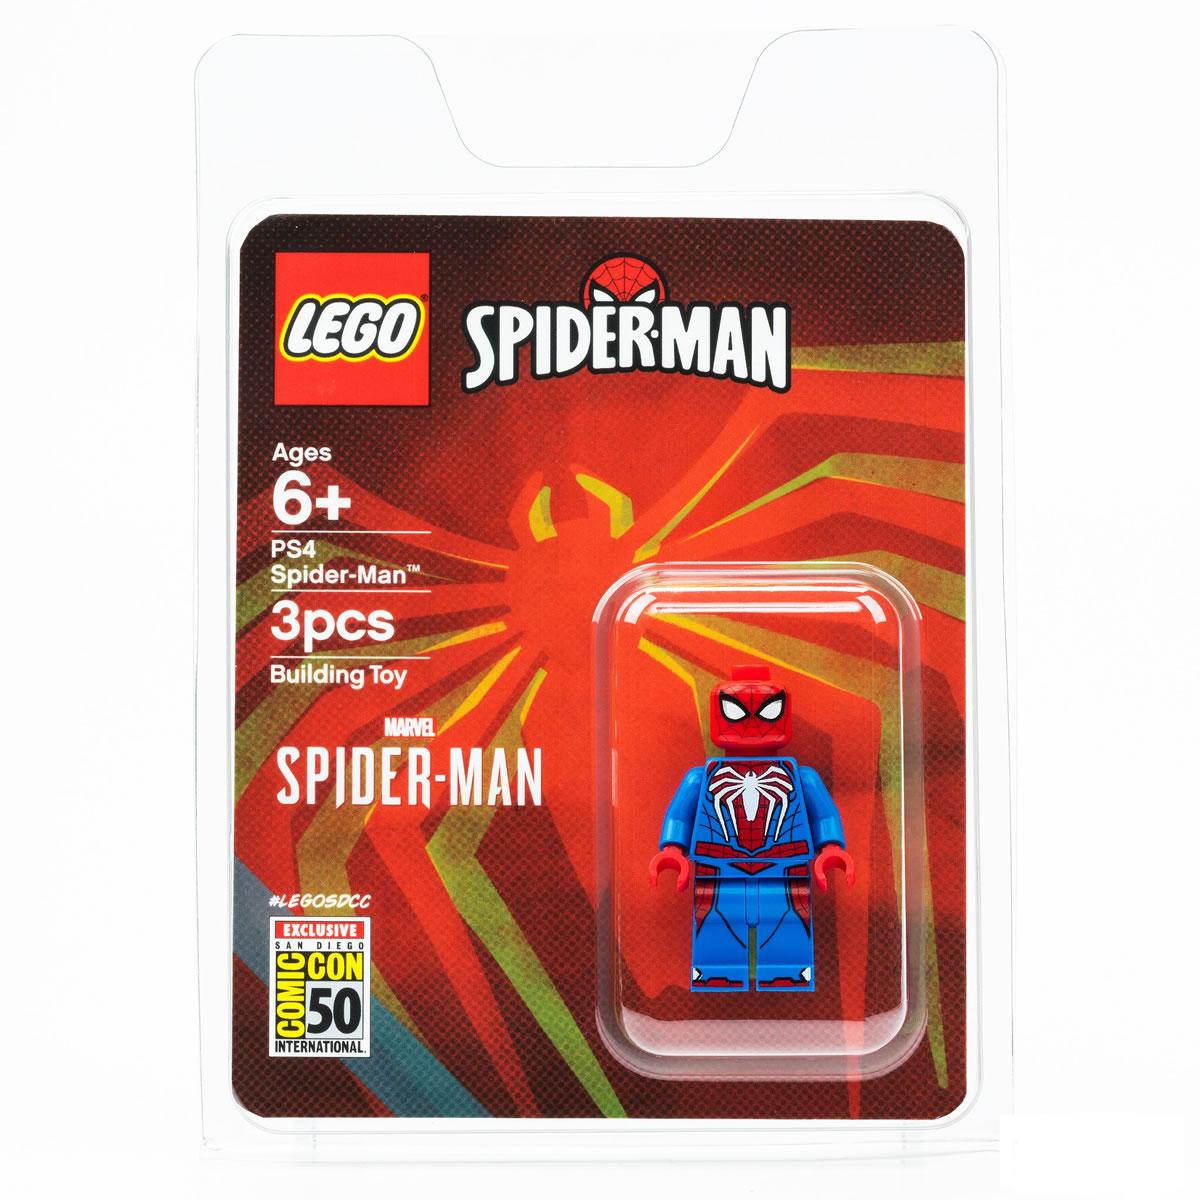 lego-marvel-spider-man-exclusive-minifigure-verpackung-san-diego-comic-con-2019 zusammengebaut.com